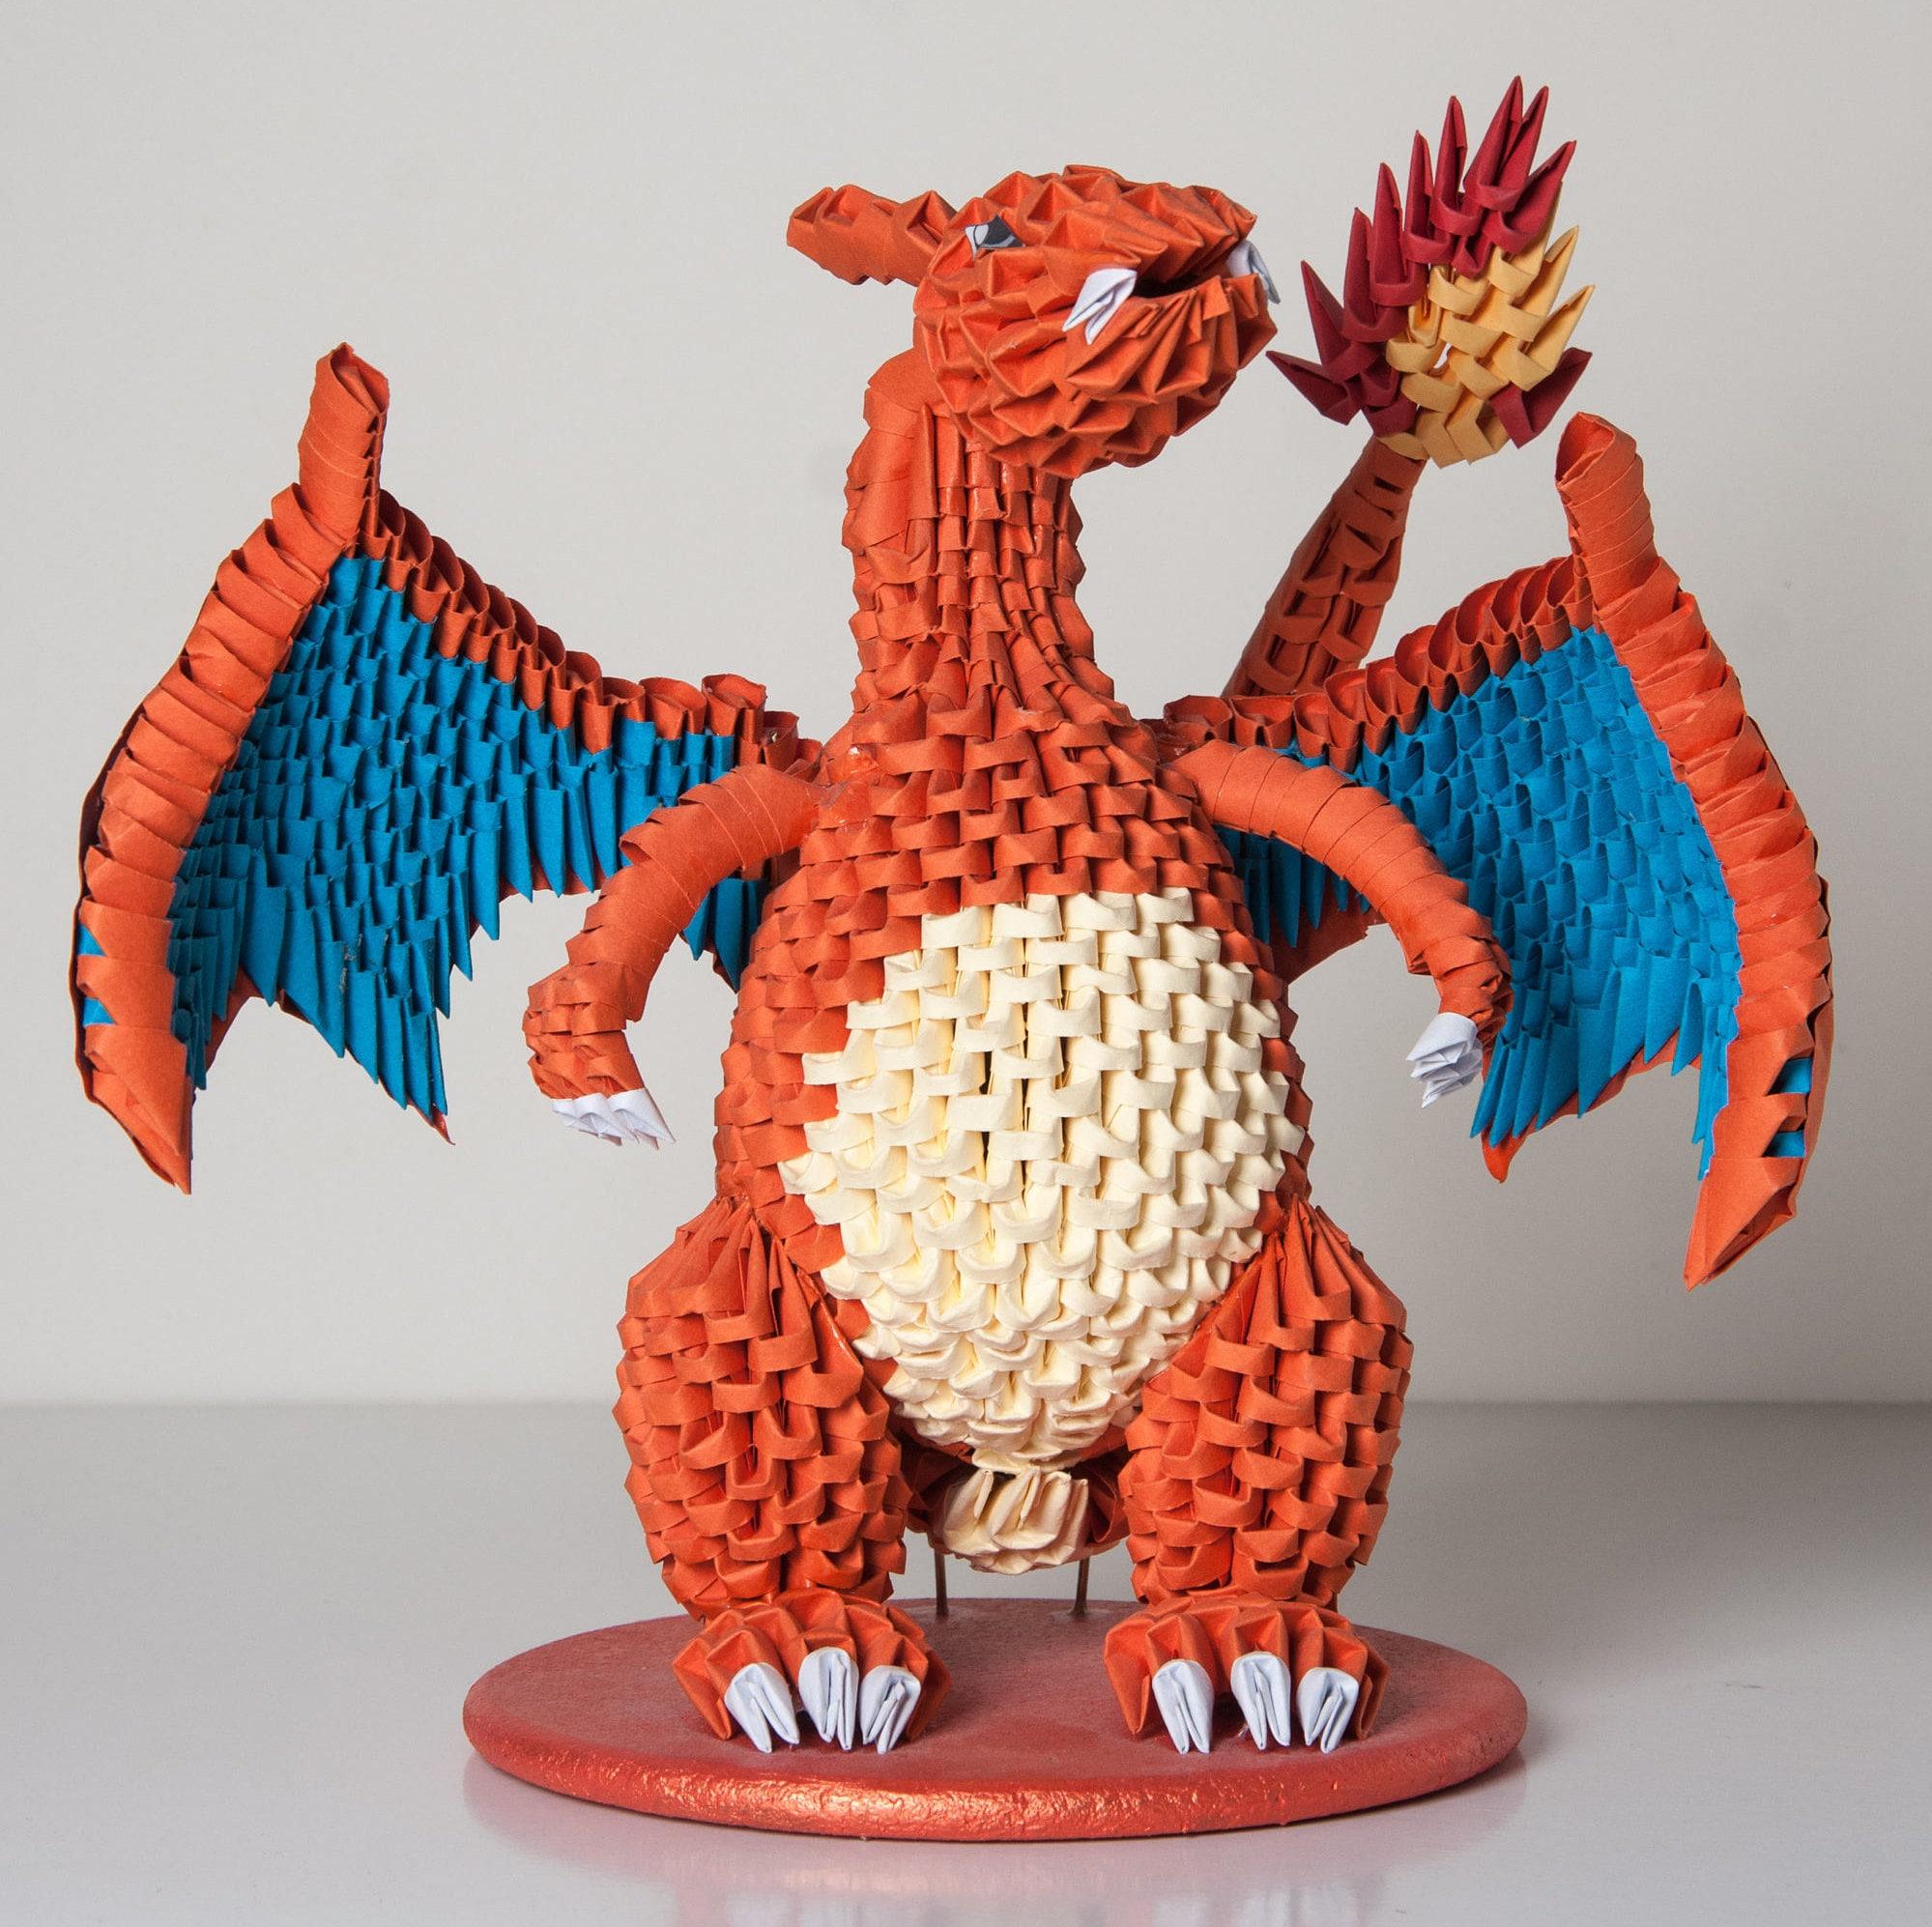 3D ORIGAMI CHARIZARD POKEMON - photo#21